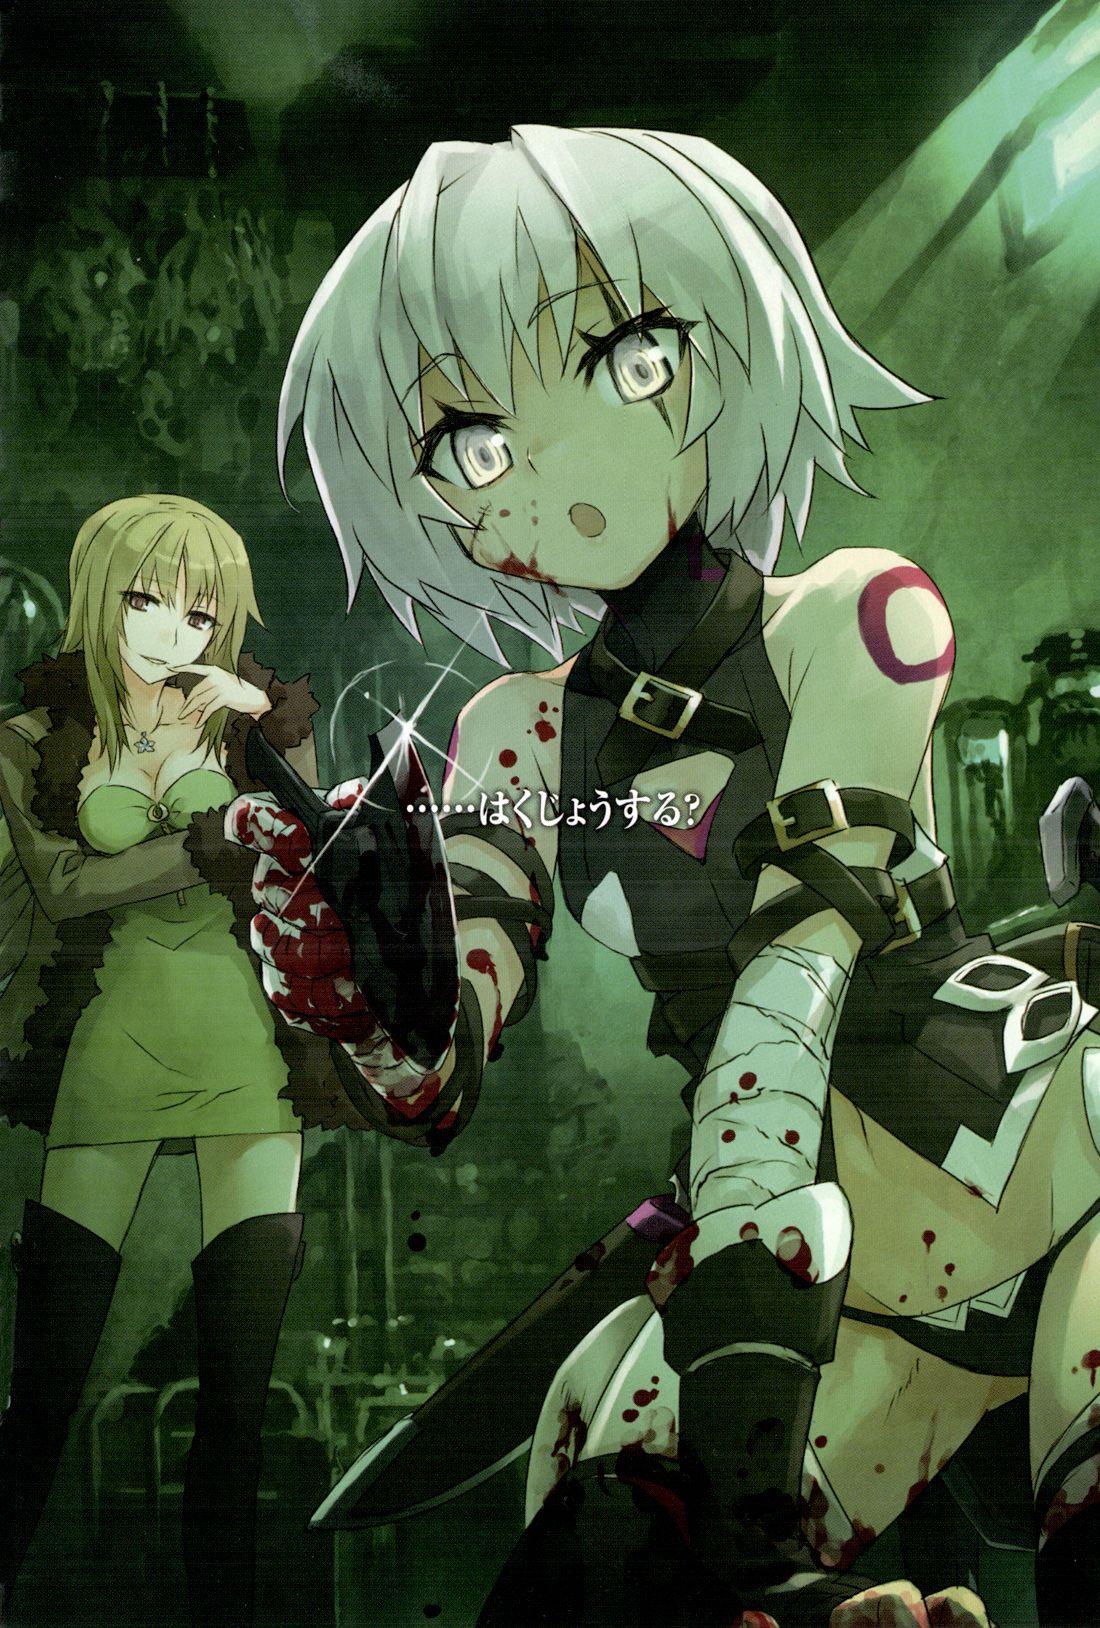 Jack The Ripper And Reika Rikodou Anime Fate Apocrypha